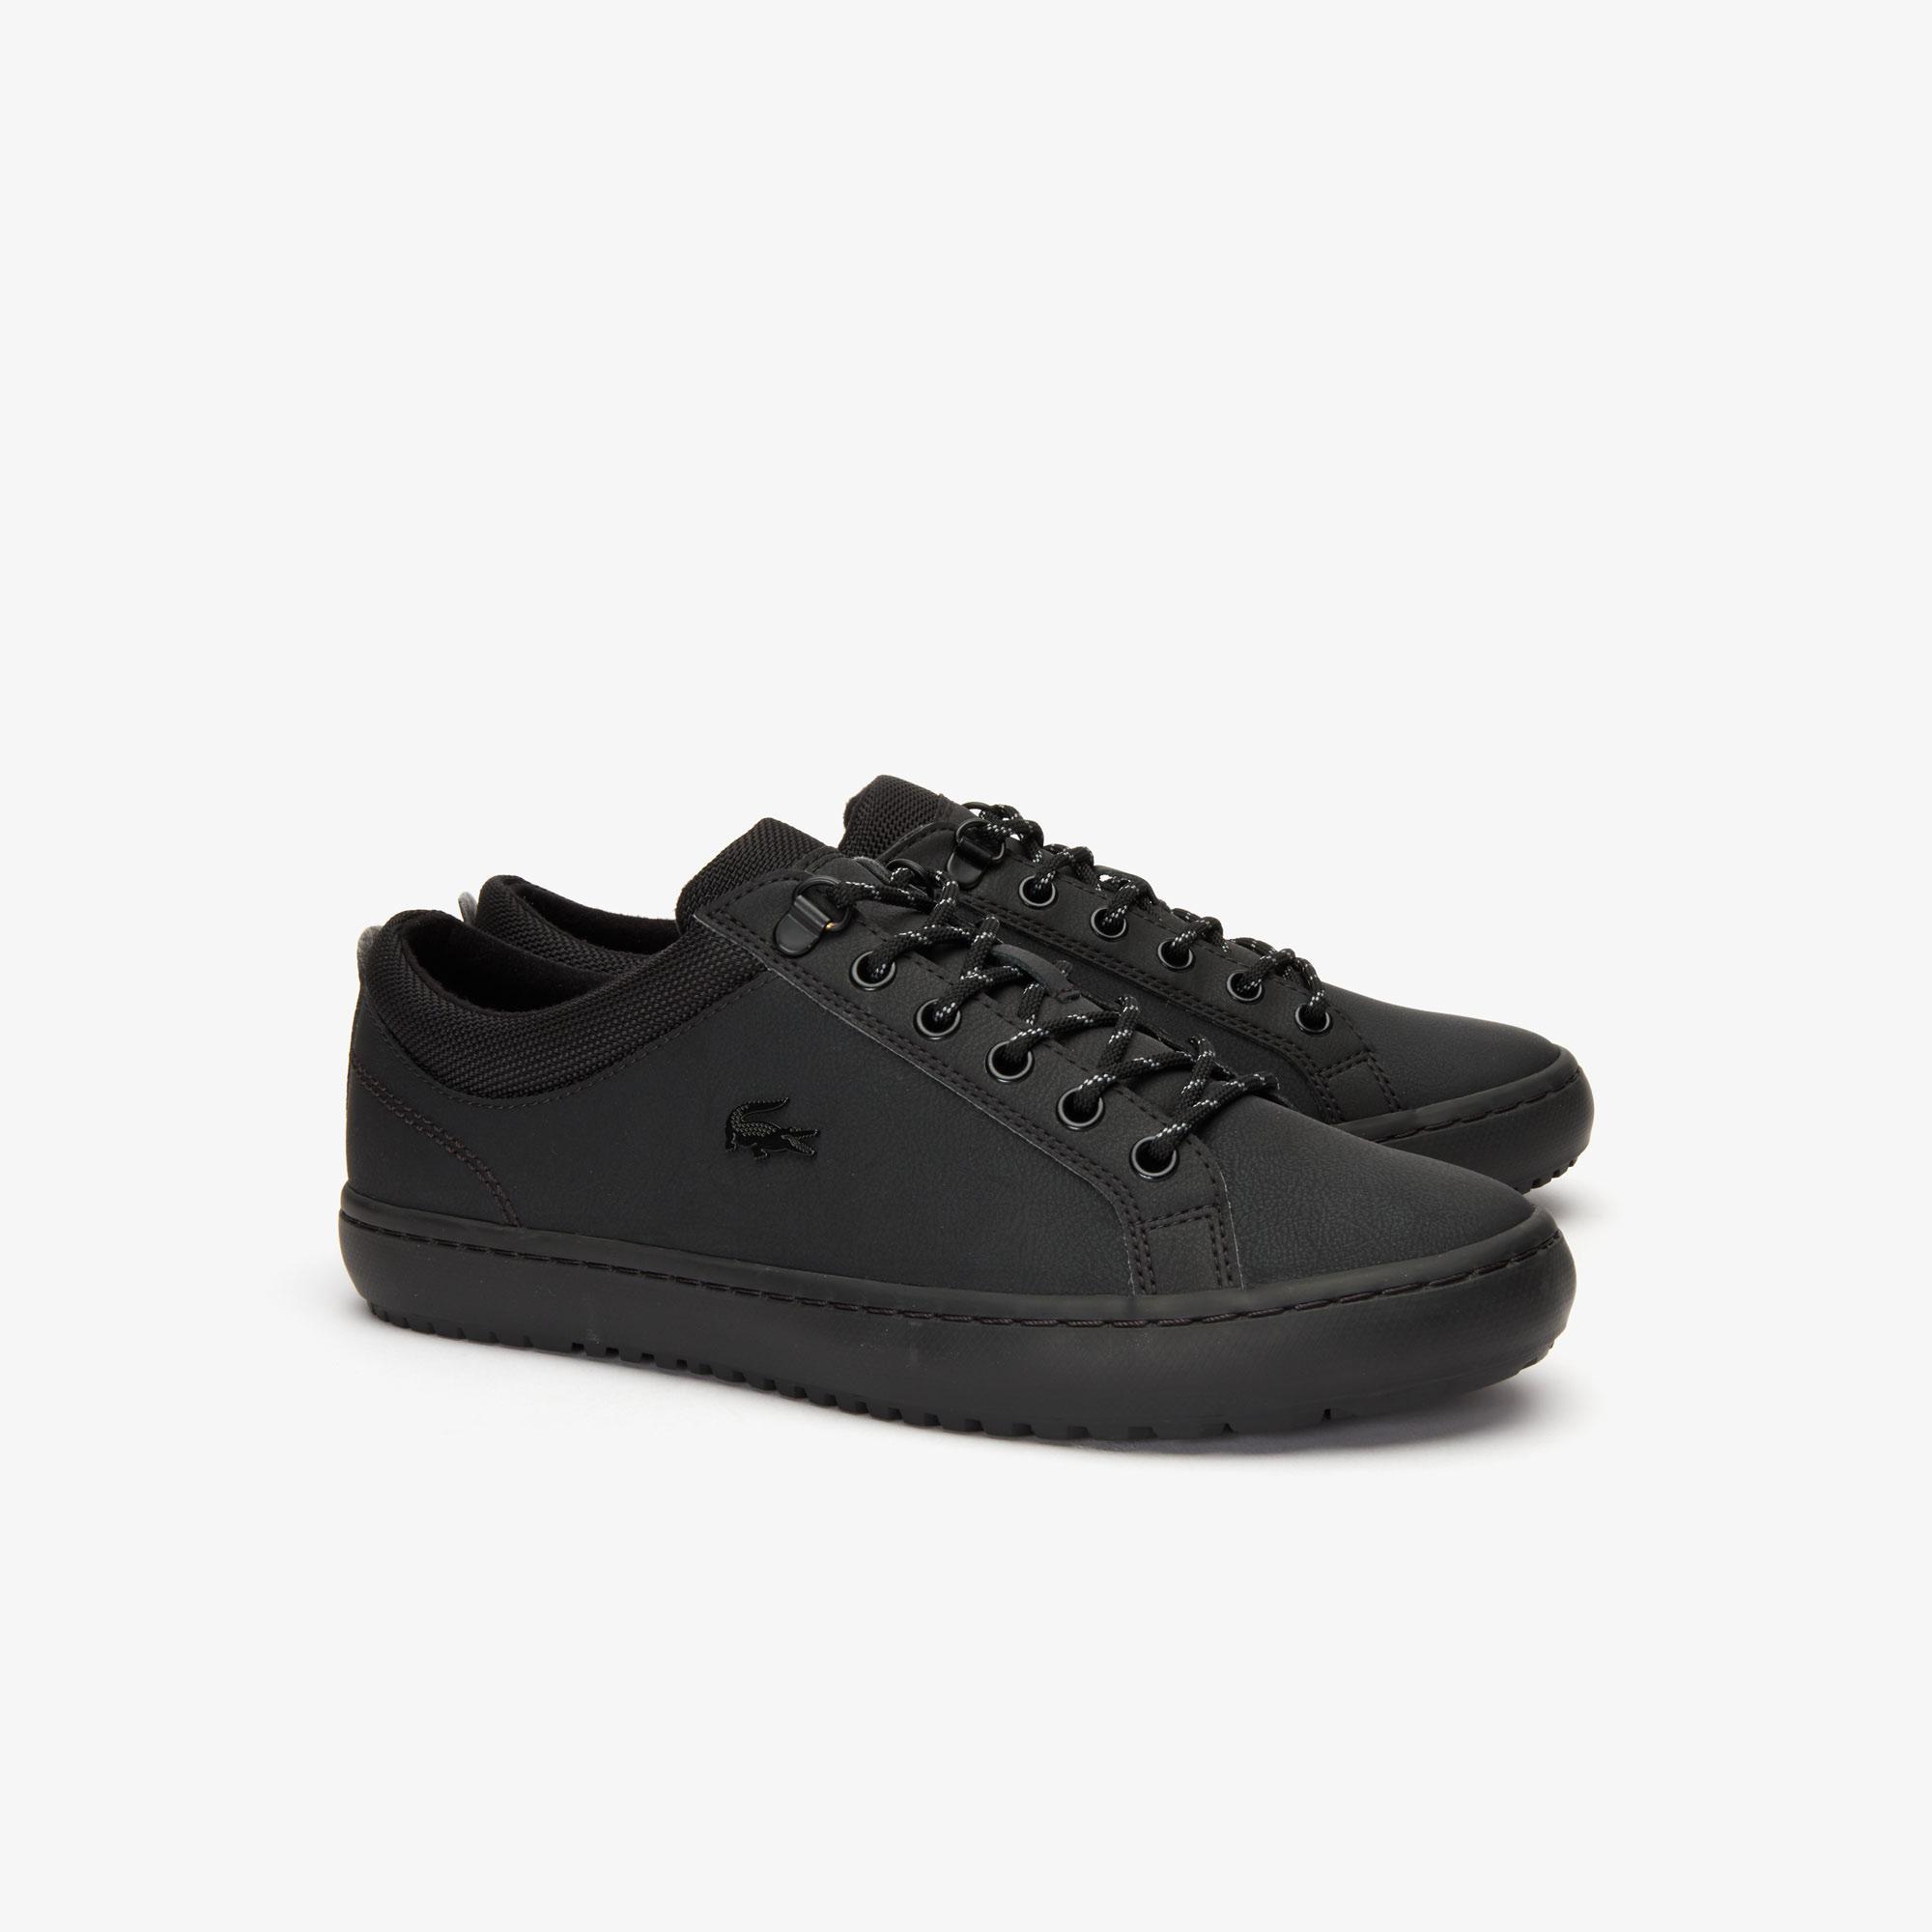 Lacoste Straightset Insulate 319 3 Cma Erkek Siyah Casual Ayakkabı